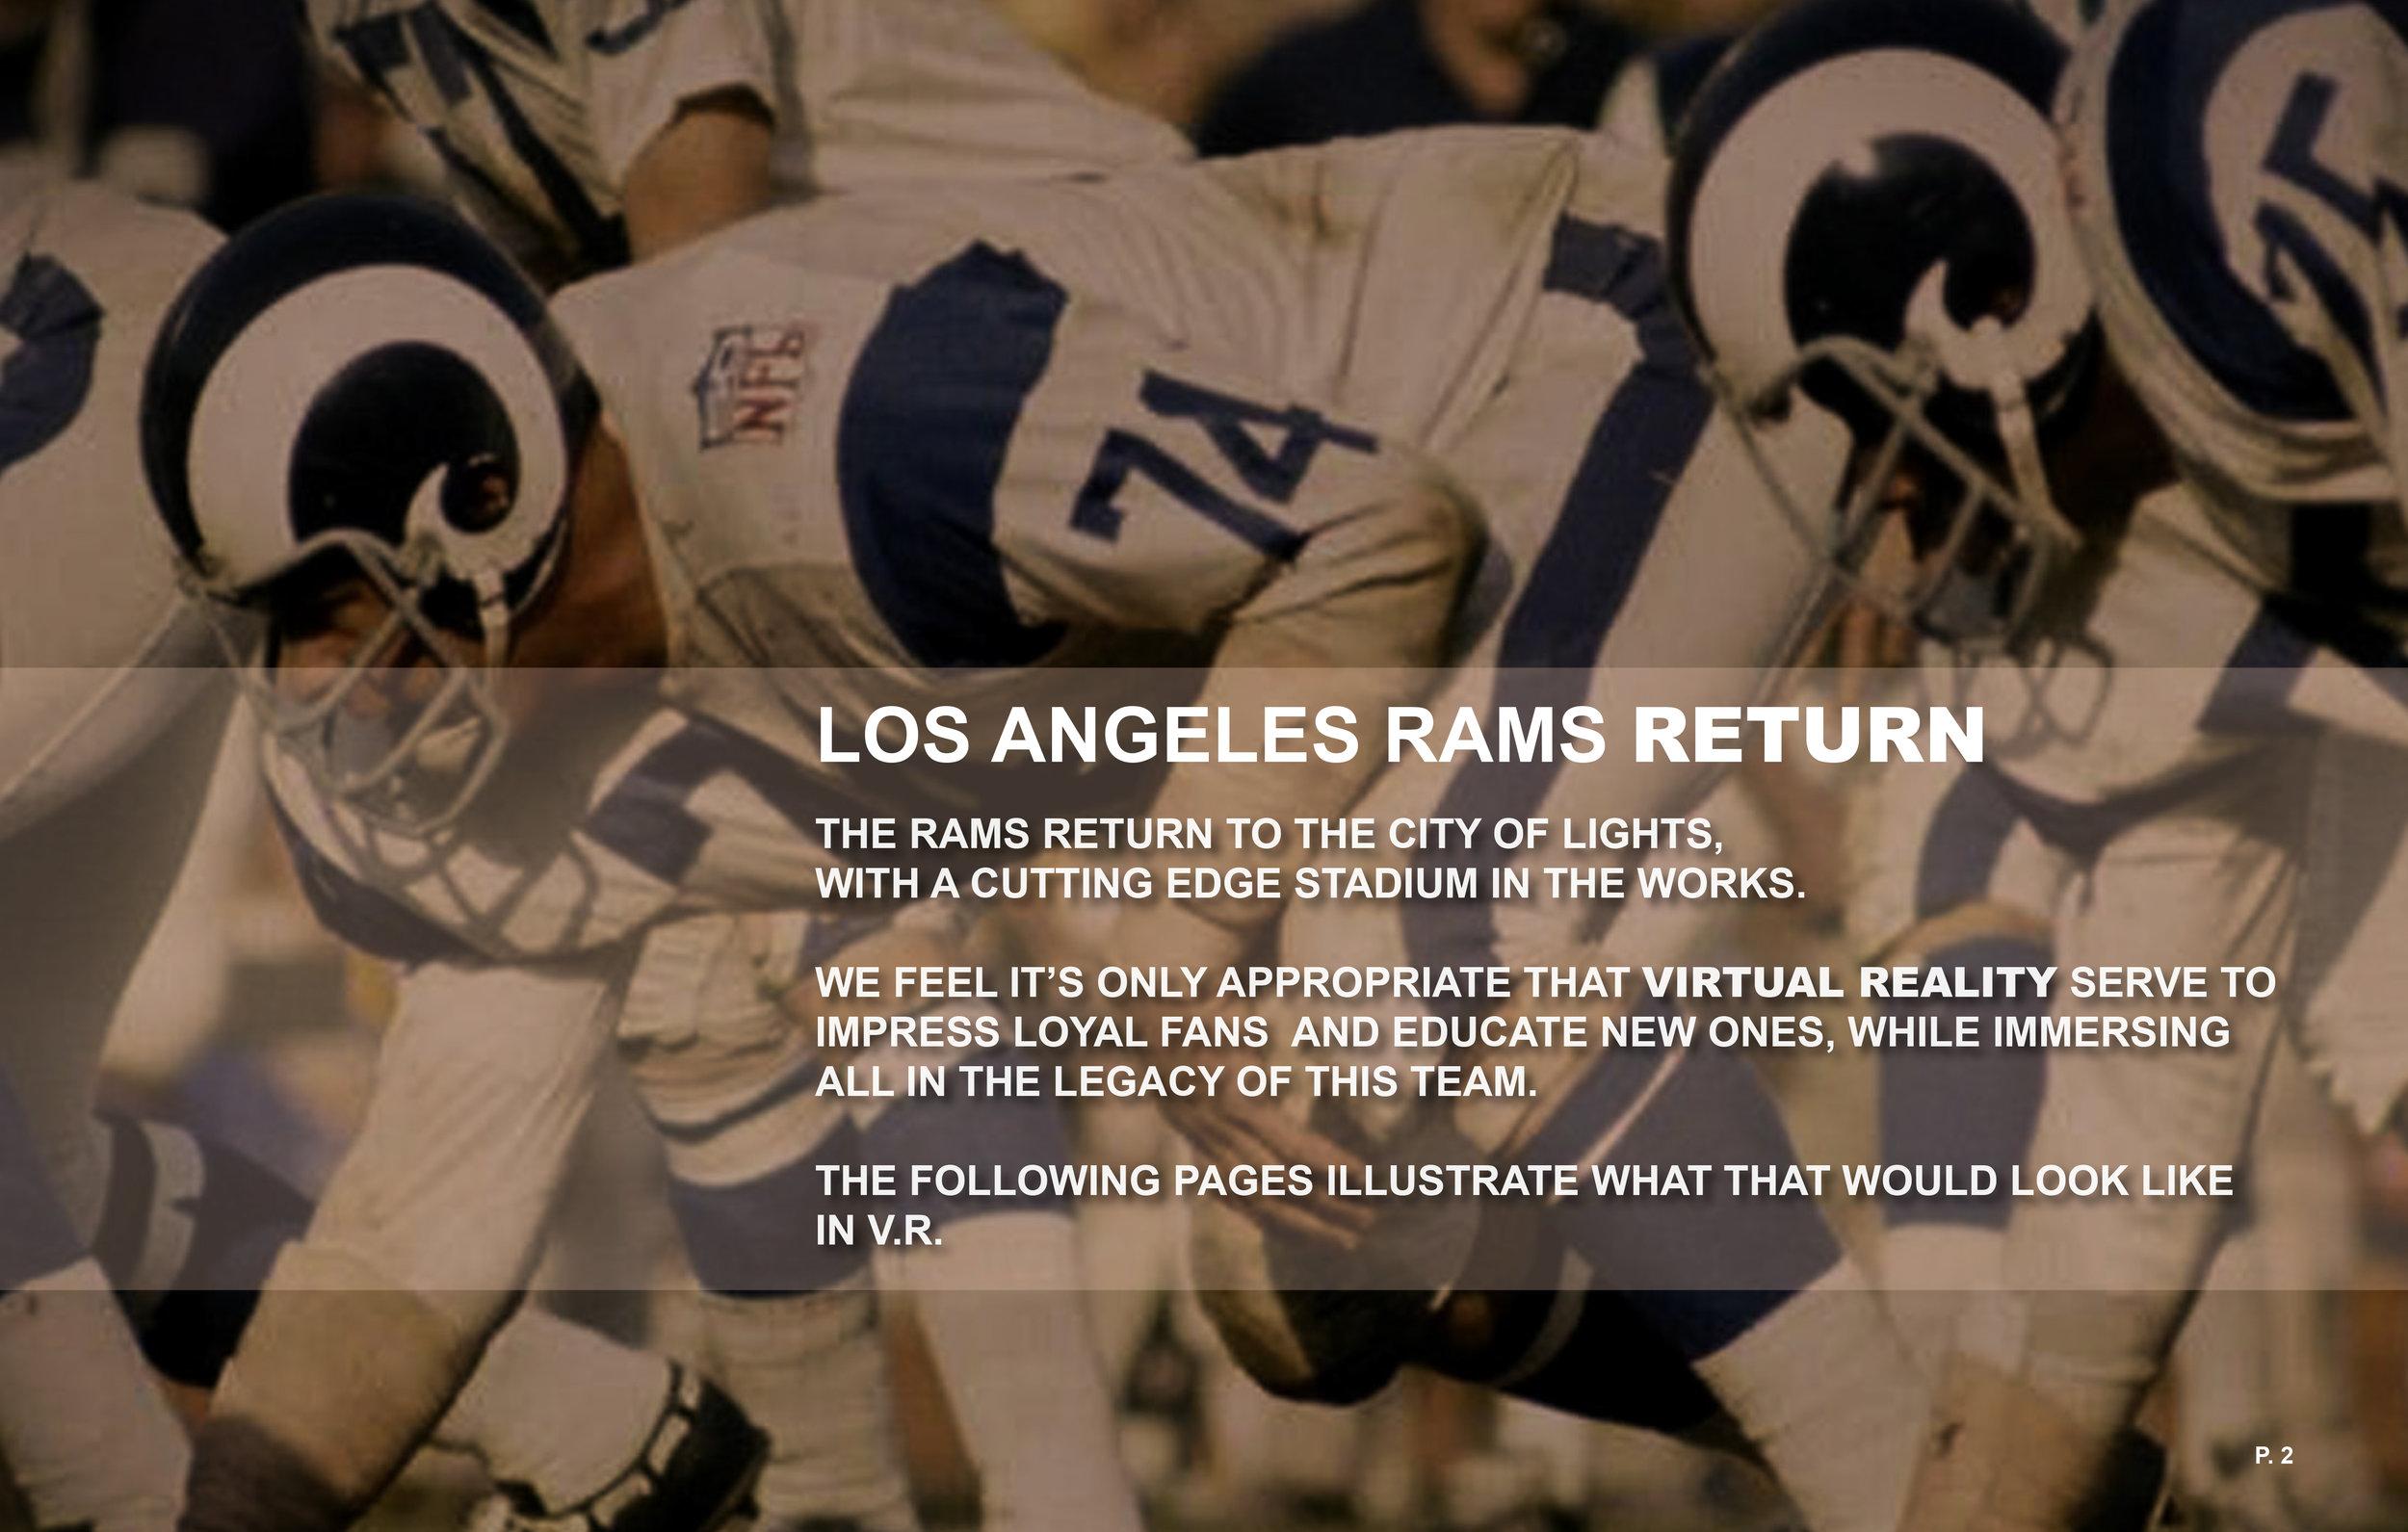 LA RAMS_VR_7_22-2.jpg